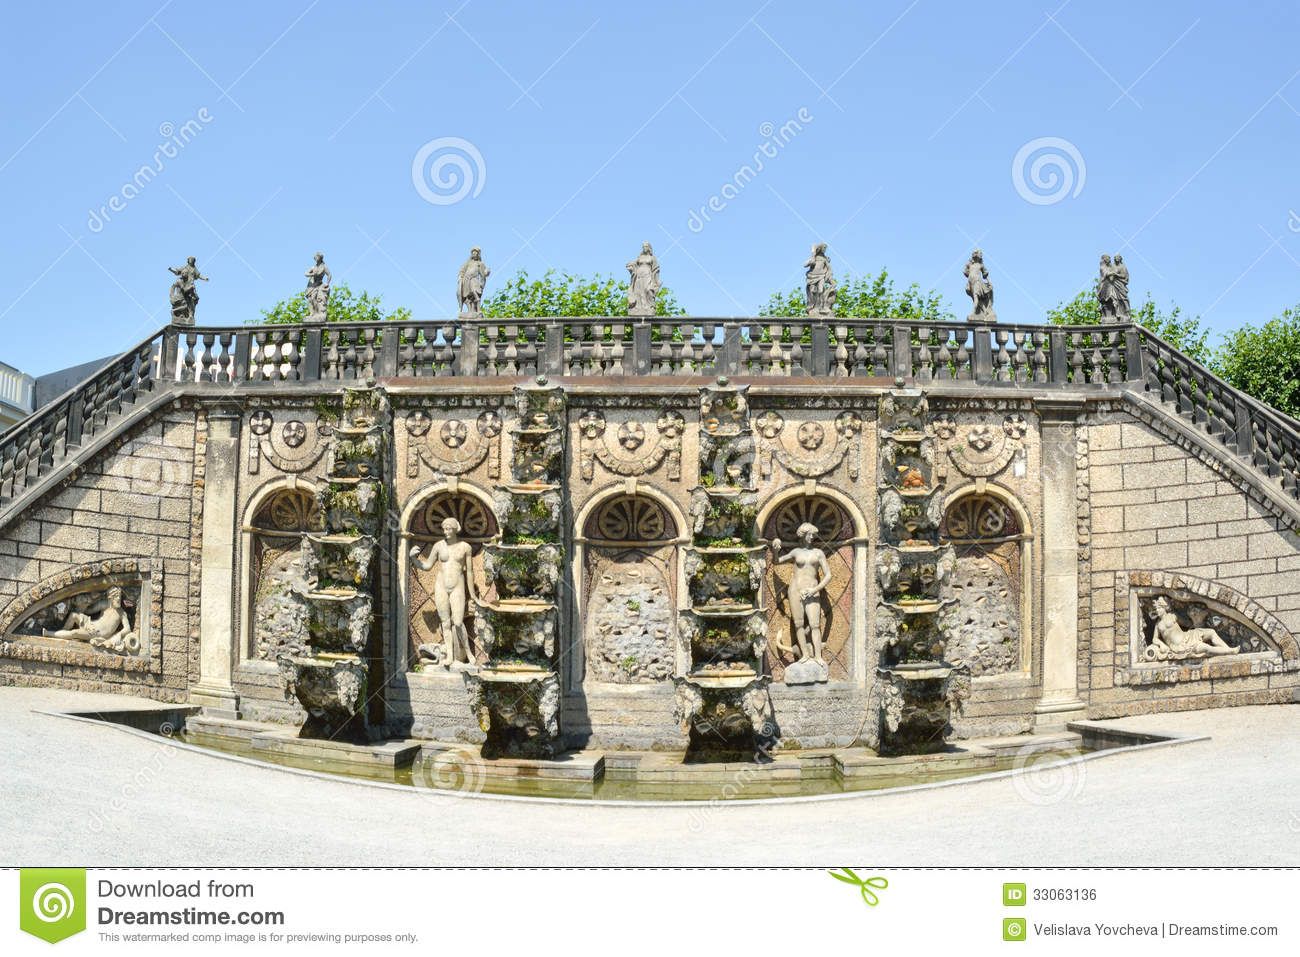 Herrenhausen Gardens Landmark, Germany Royalty Free Stock Images.